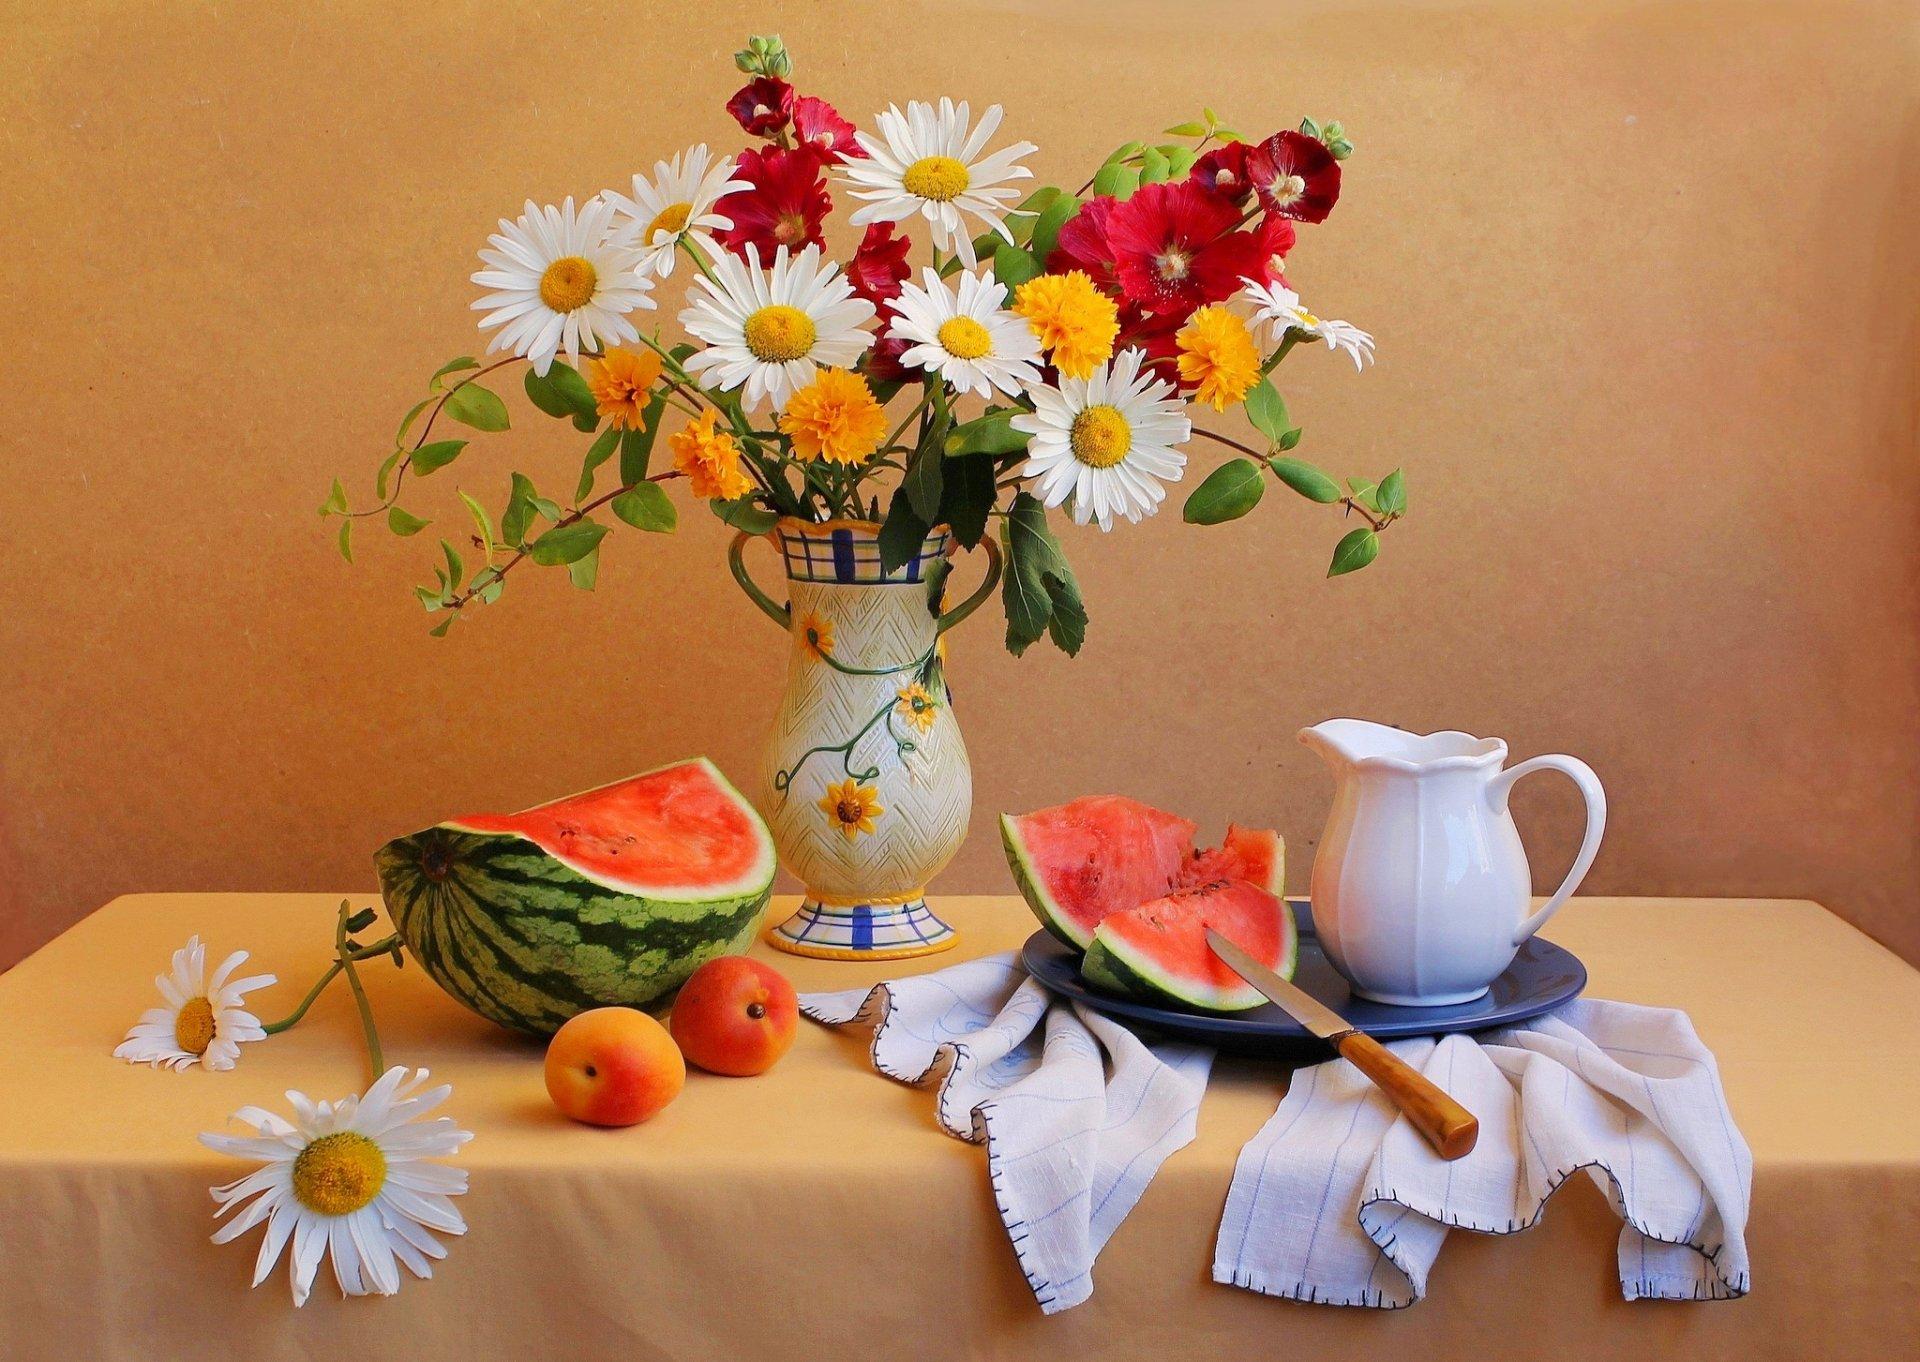 https://w-dog.ru/wallpapers/13/13/538349336458277/natyurmort-stol-nozh-kuvshin-vaza-buket-cvety-arbuz-abrikos.jpg